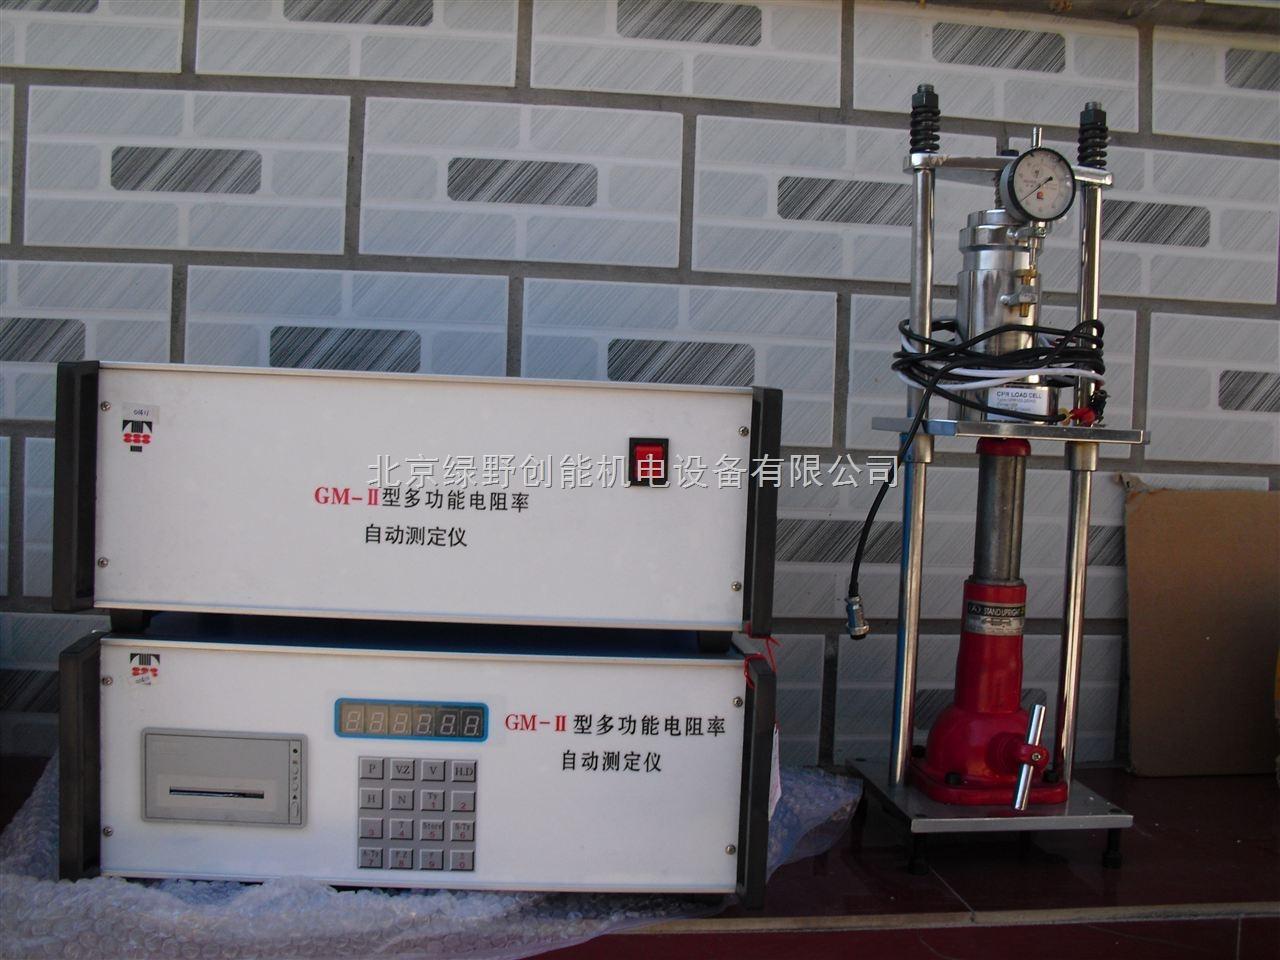 gm-ii-多功能电阻率自动测定仪